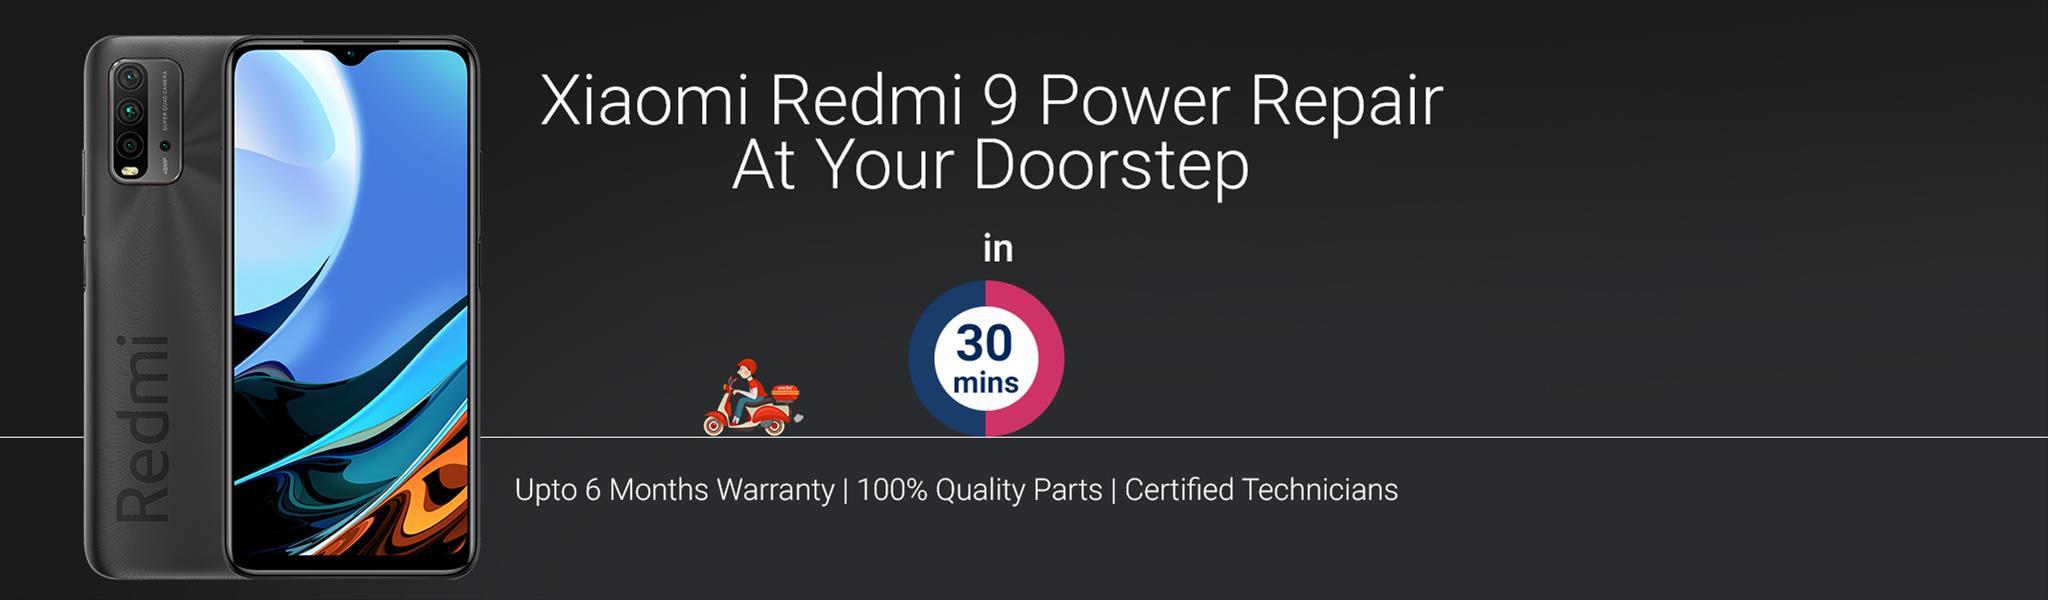 xiaomi-redmi-9-power.jpg